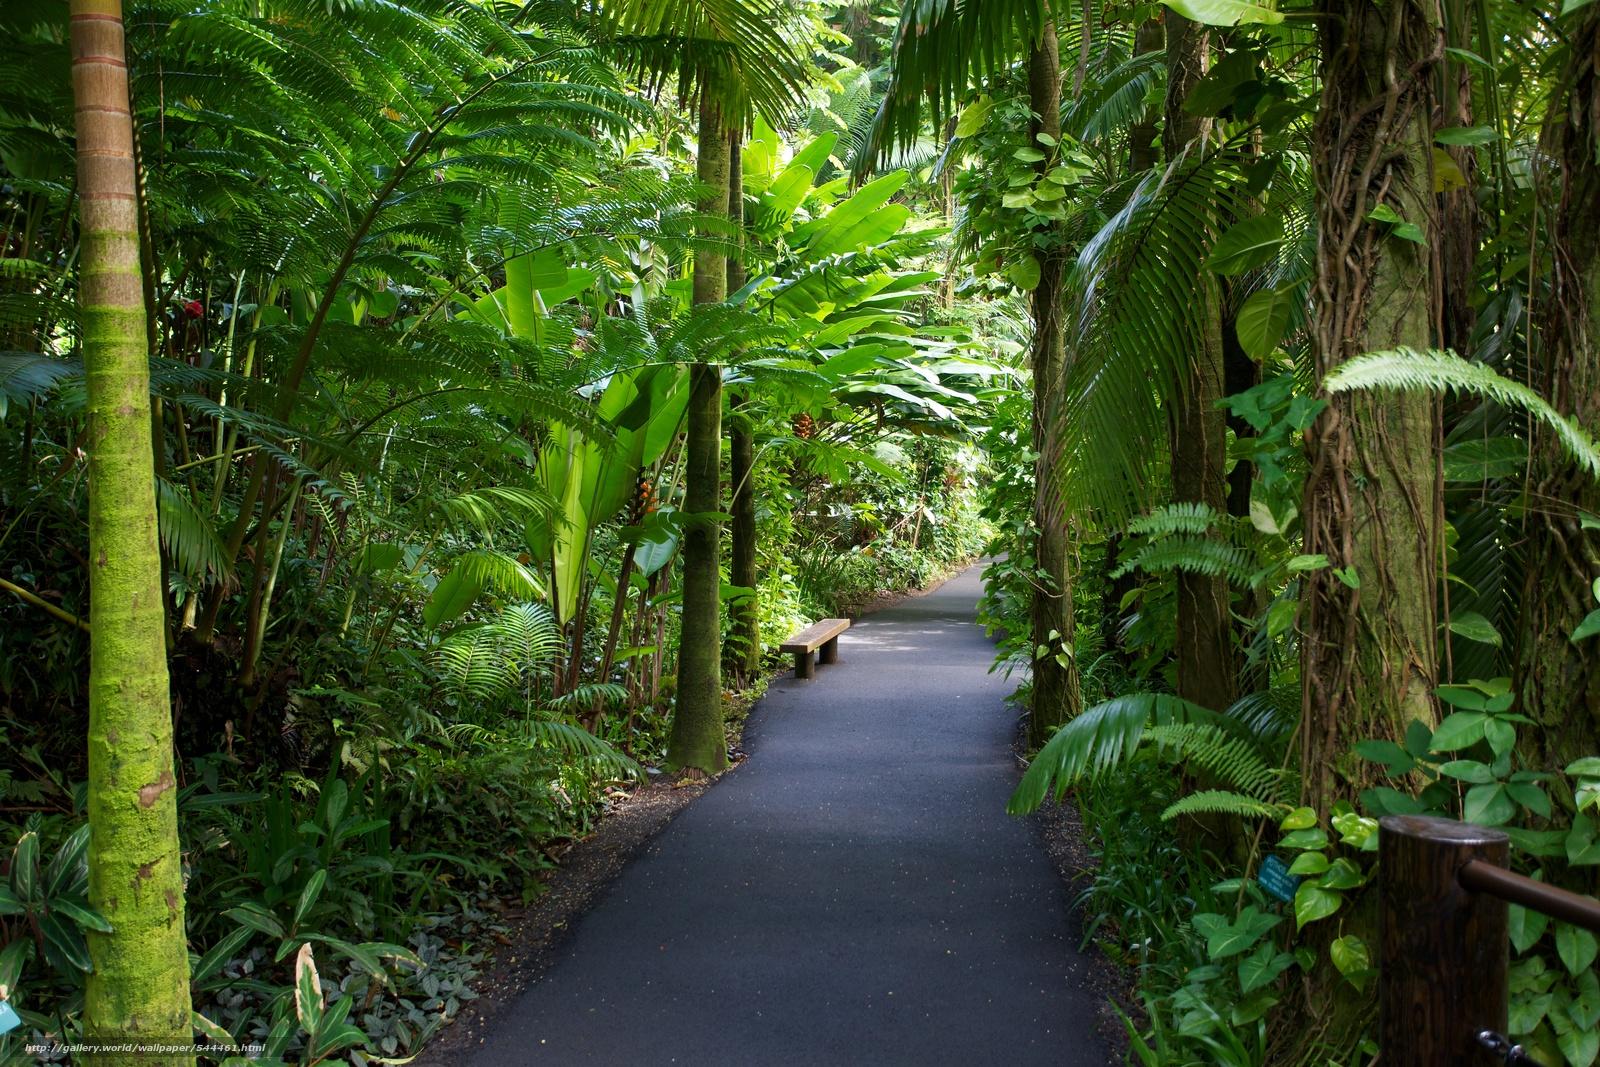 Download Wallpaper Hawaii Tropical Botanical Garden Garden Nature Free Desktop Wallpaper In